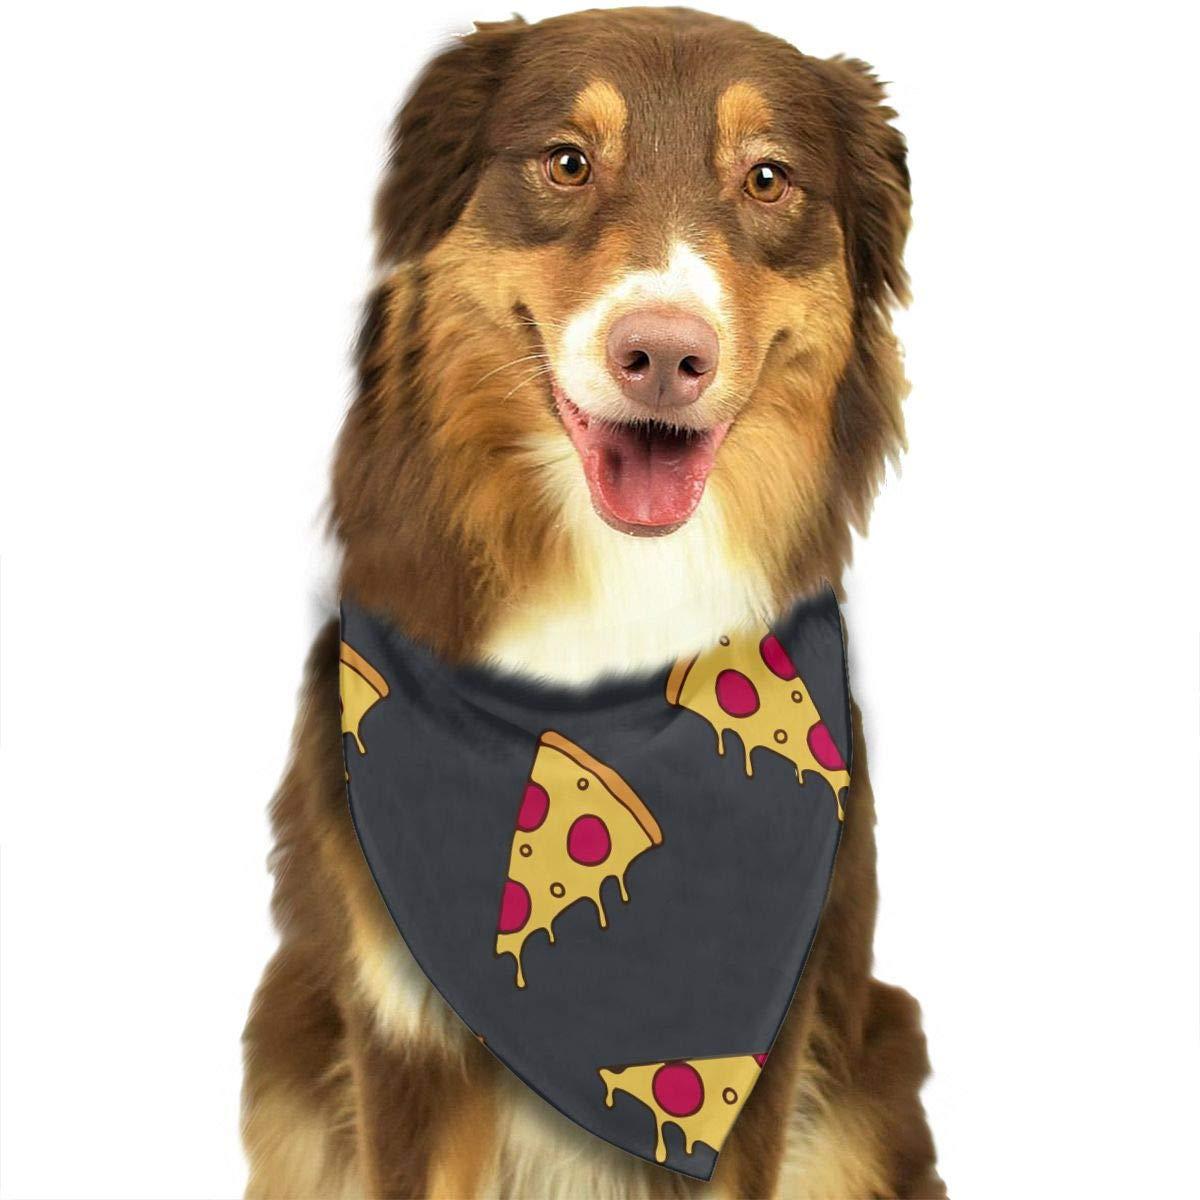 CHAN03 Dogs Bandana Collars Italy Pizza Pets Triangle Neckerchief Puppy Bibs Scarfs Cats Scarfs Towel